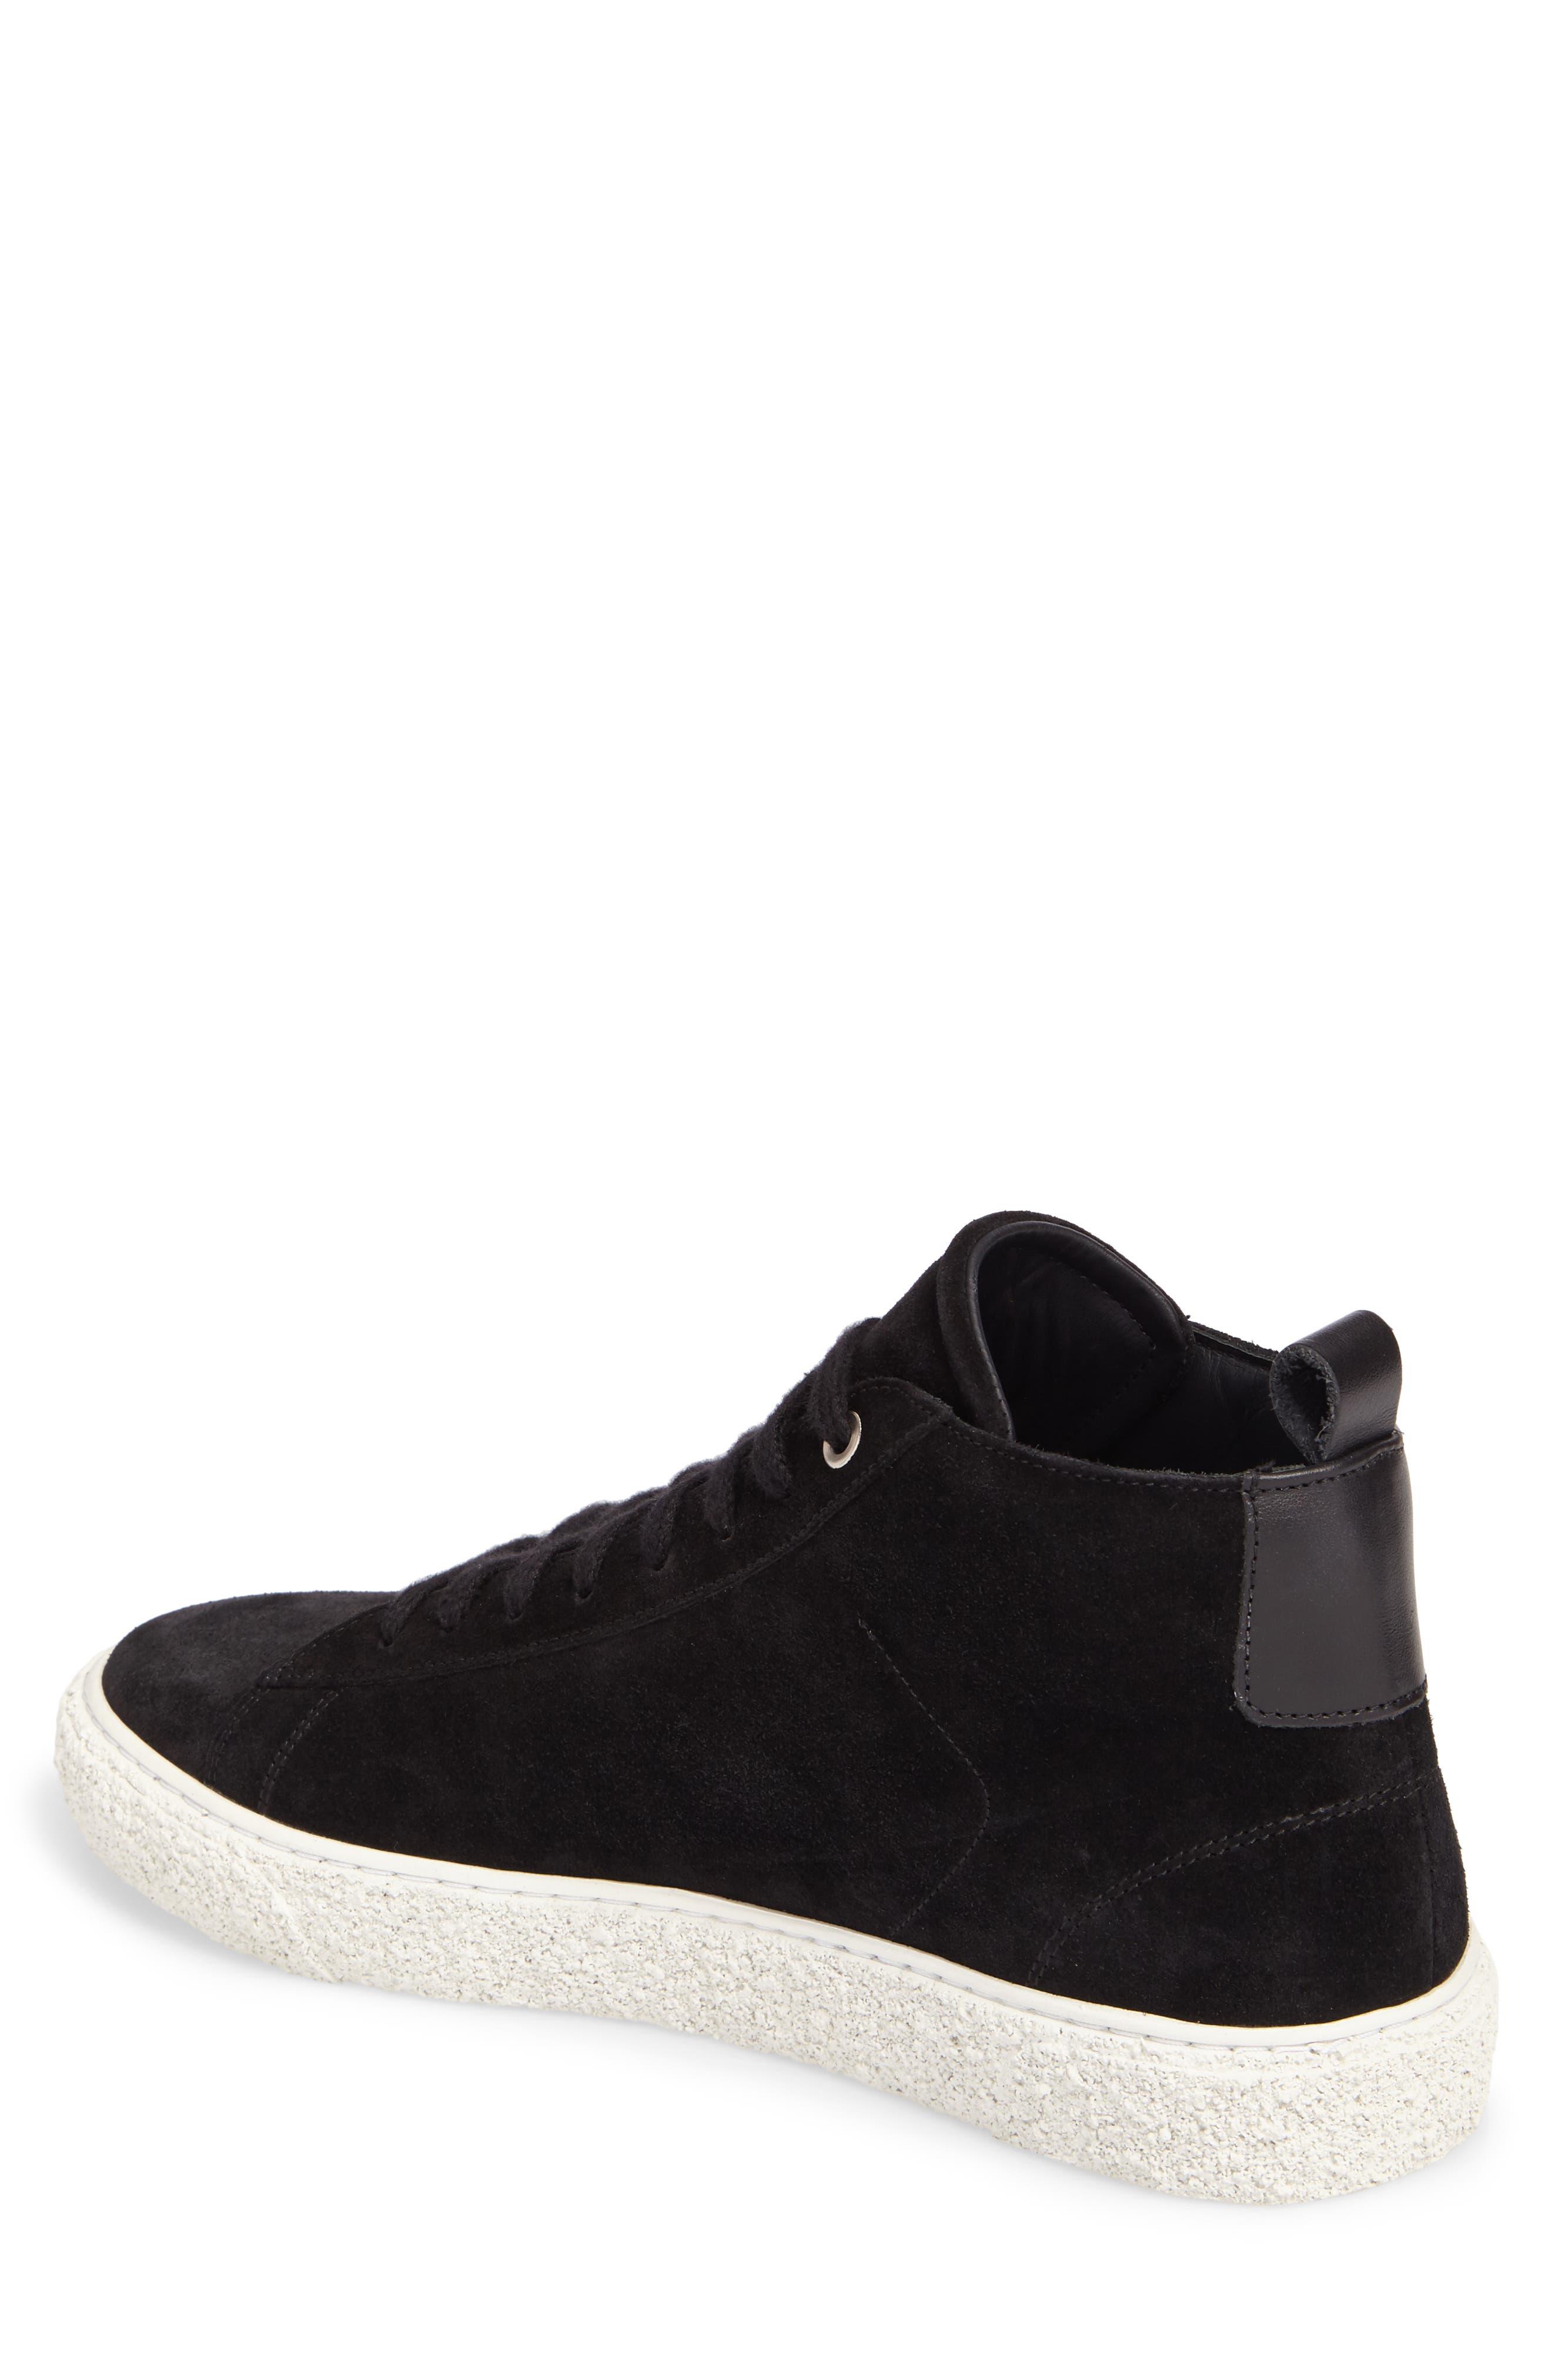 Chukka Sneaker,                             Alternate thumbnail 2, color,                             Black Suede